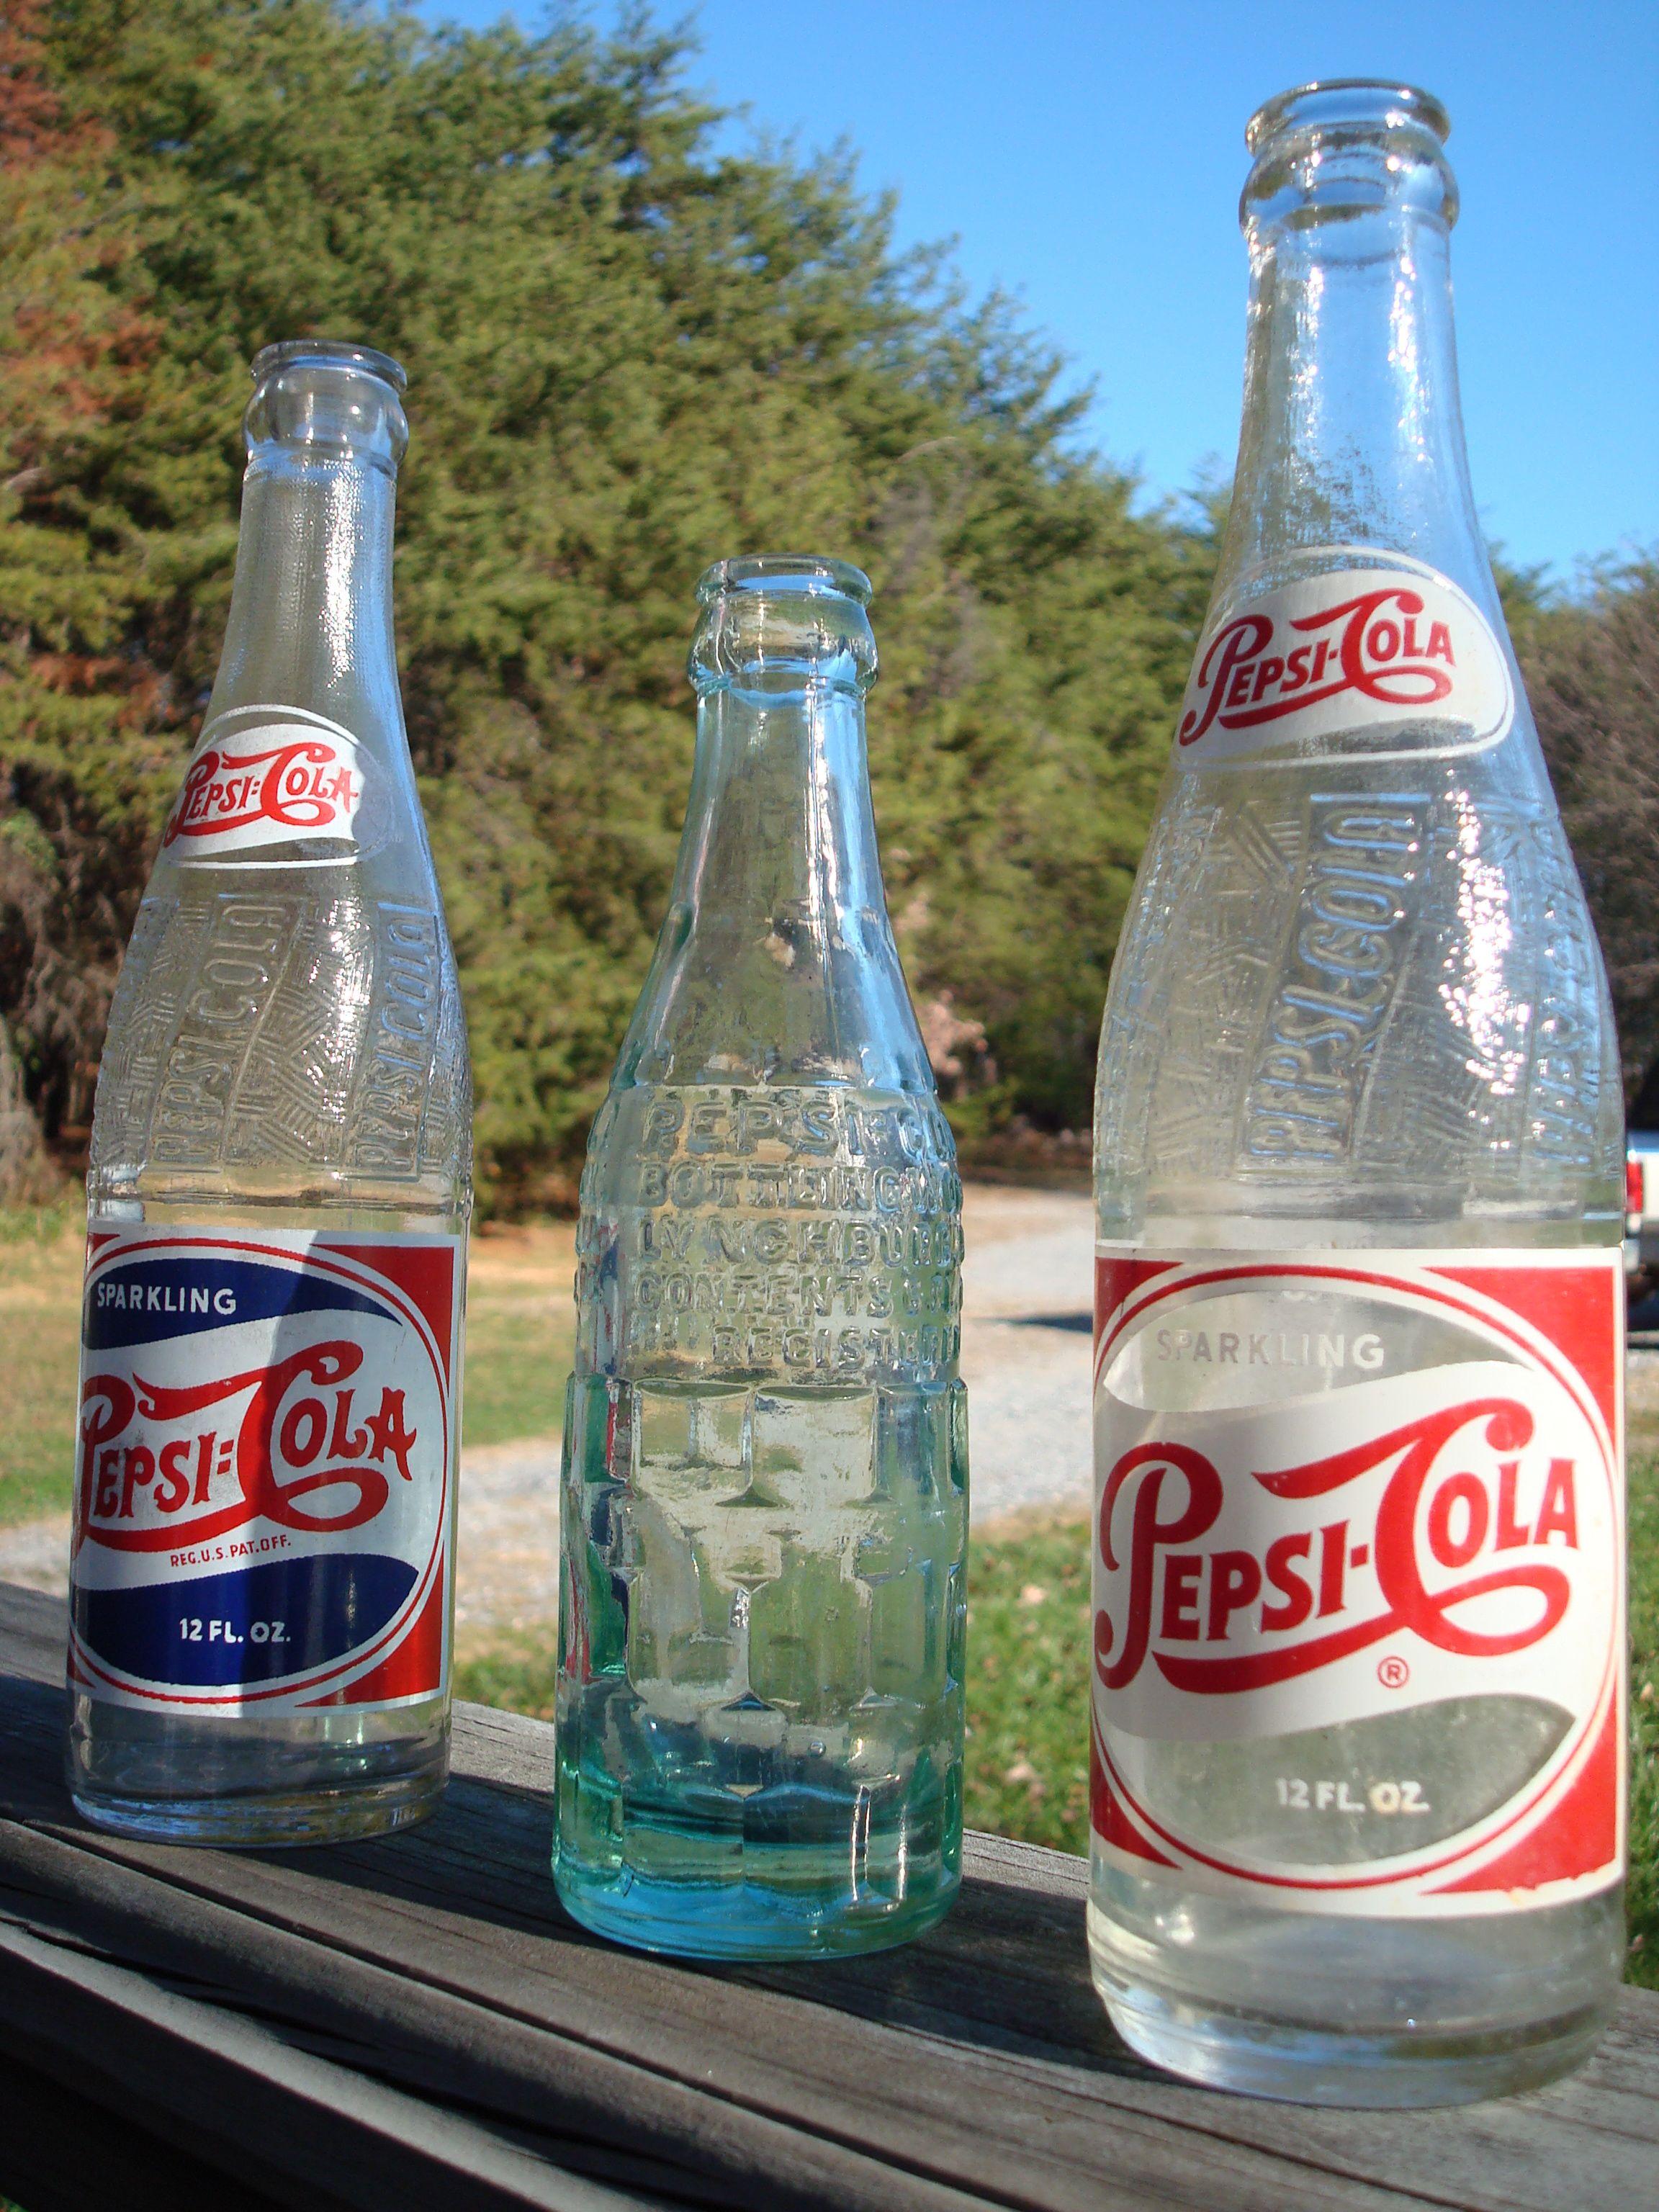 Journey Glimpse History Of Pepsi Bottles